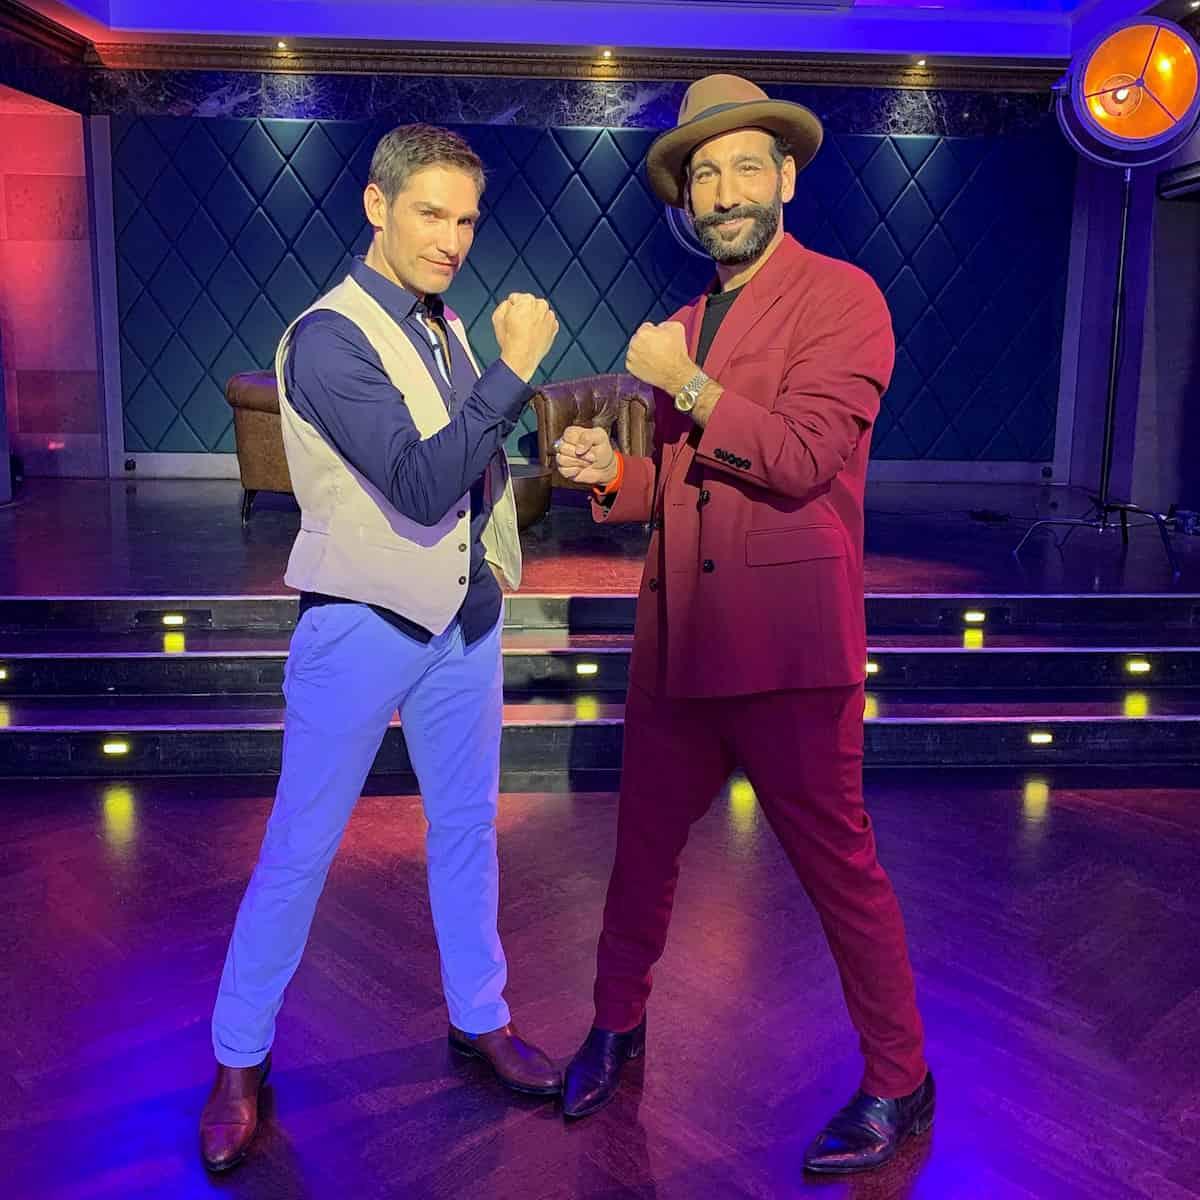 Christian Polanc und Massimo Sinato - Llambis Tanz-Duell am 26.4.2020